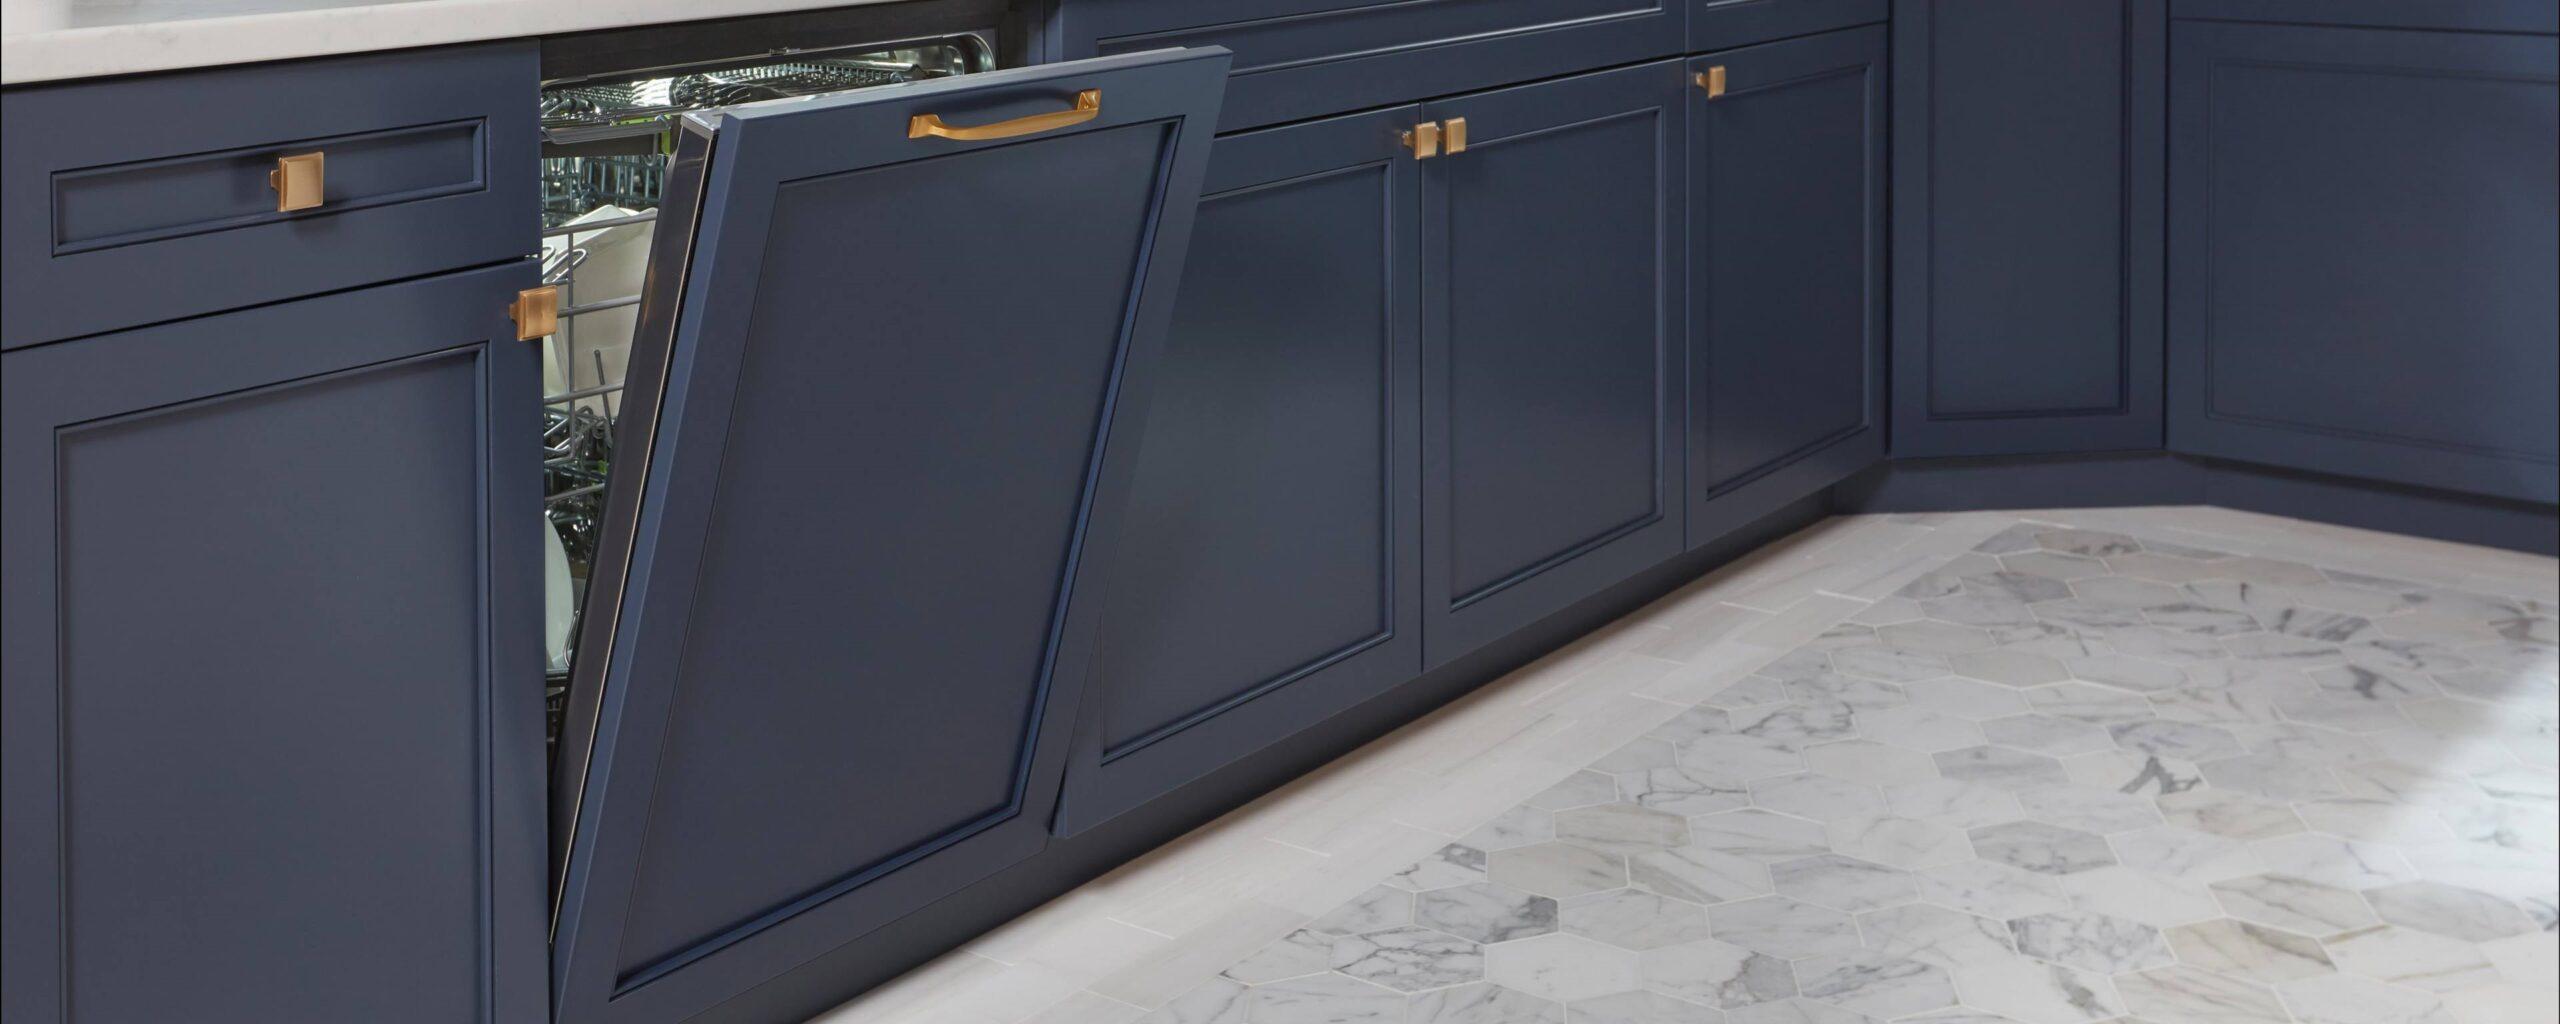 panel-ready-cove-dishwasher